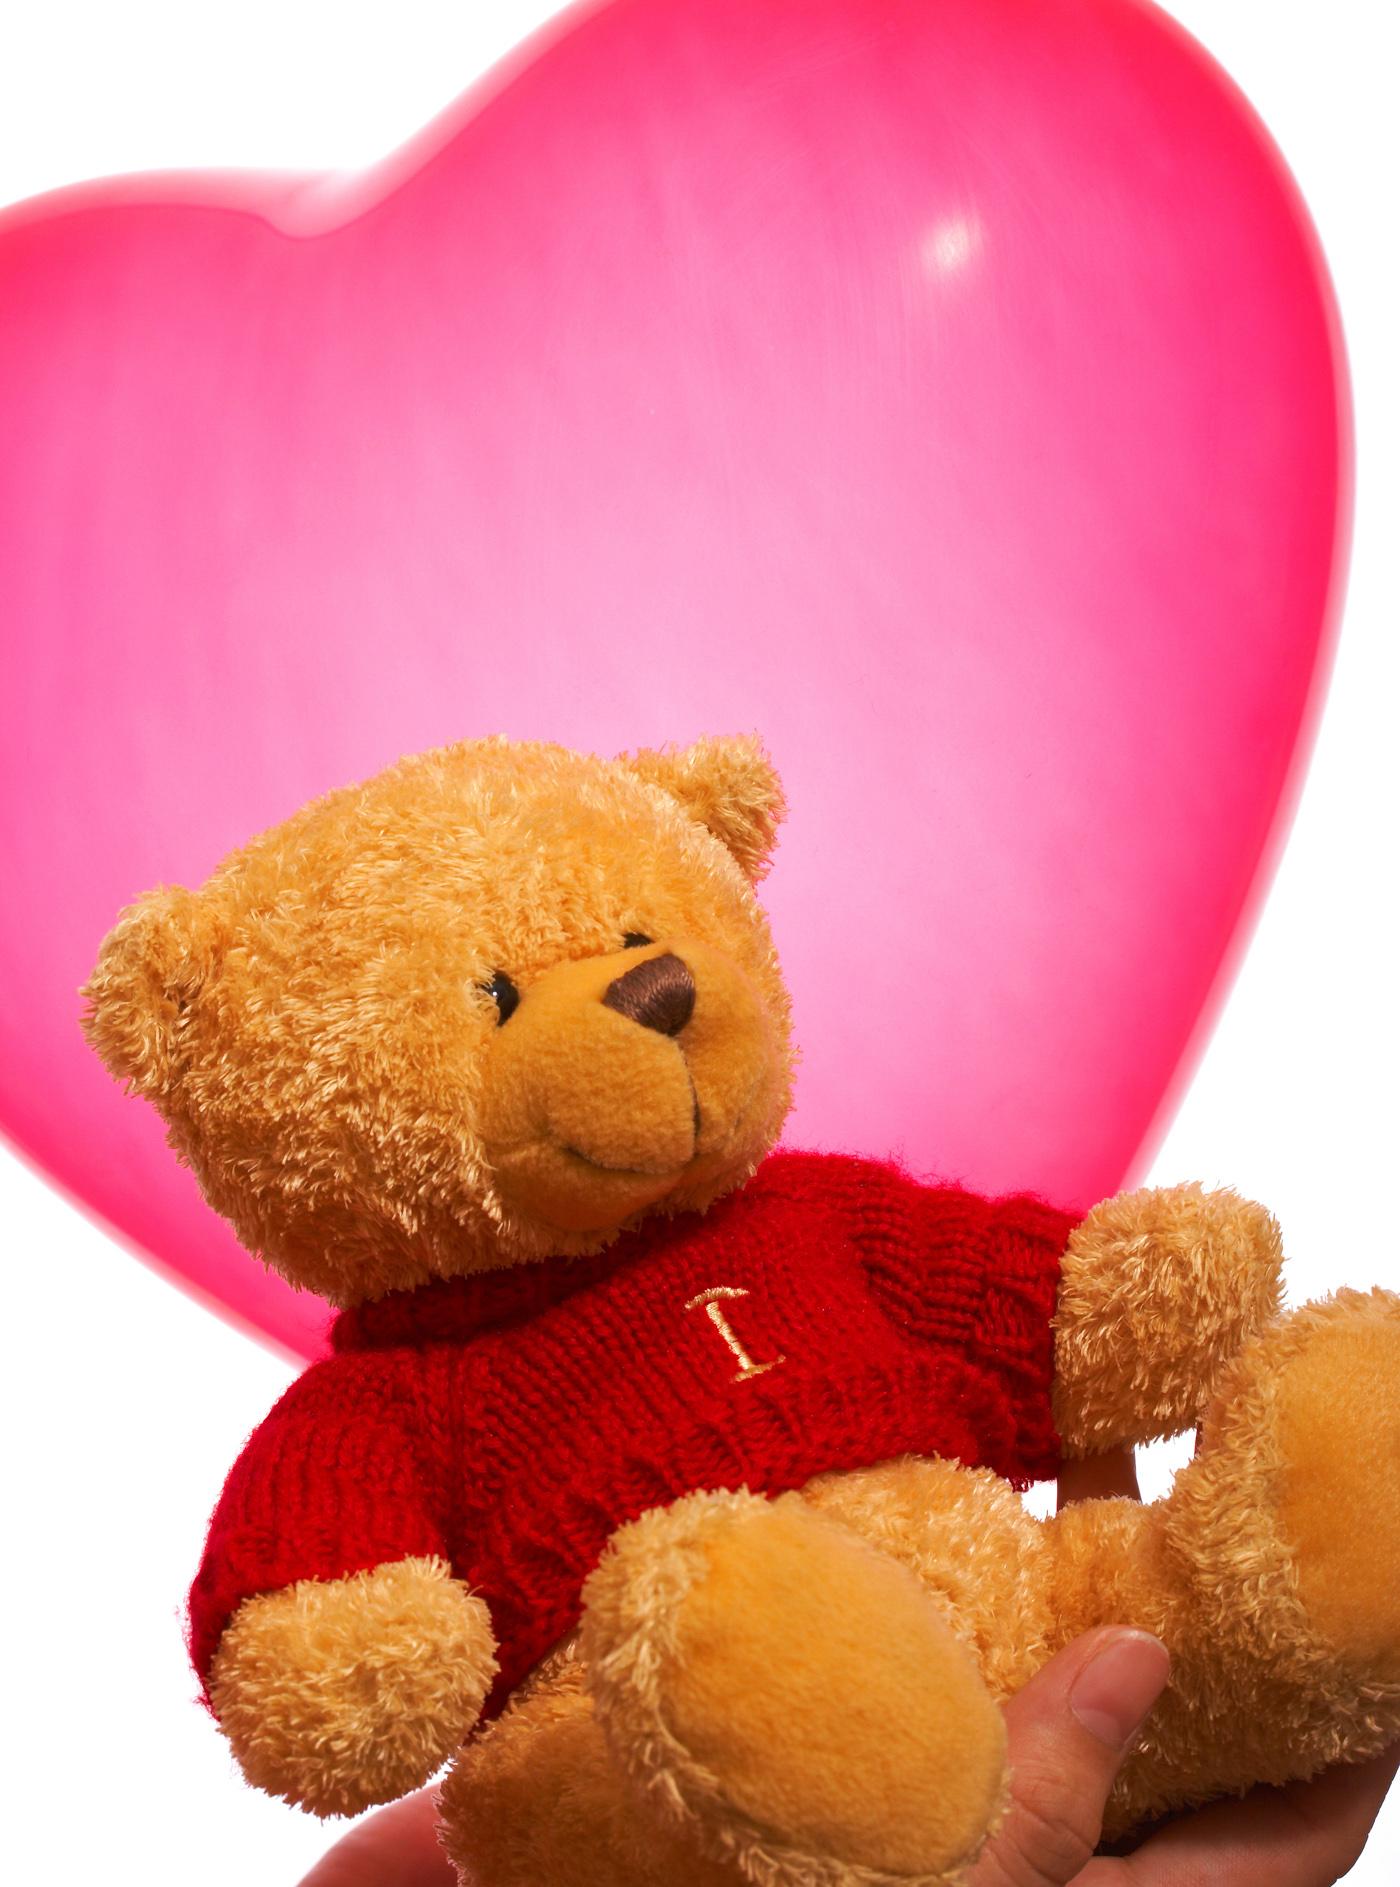 Valentine teddy bear gift or present photo